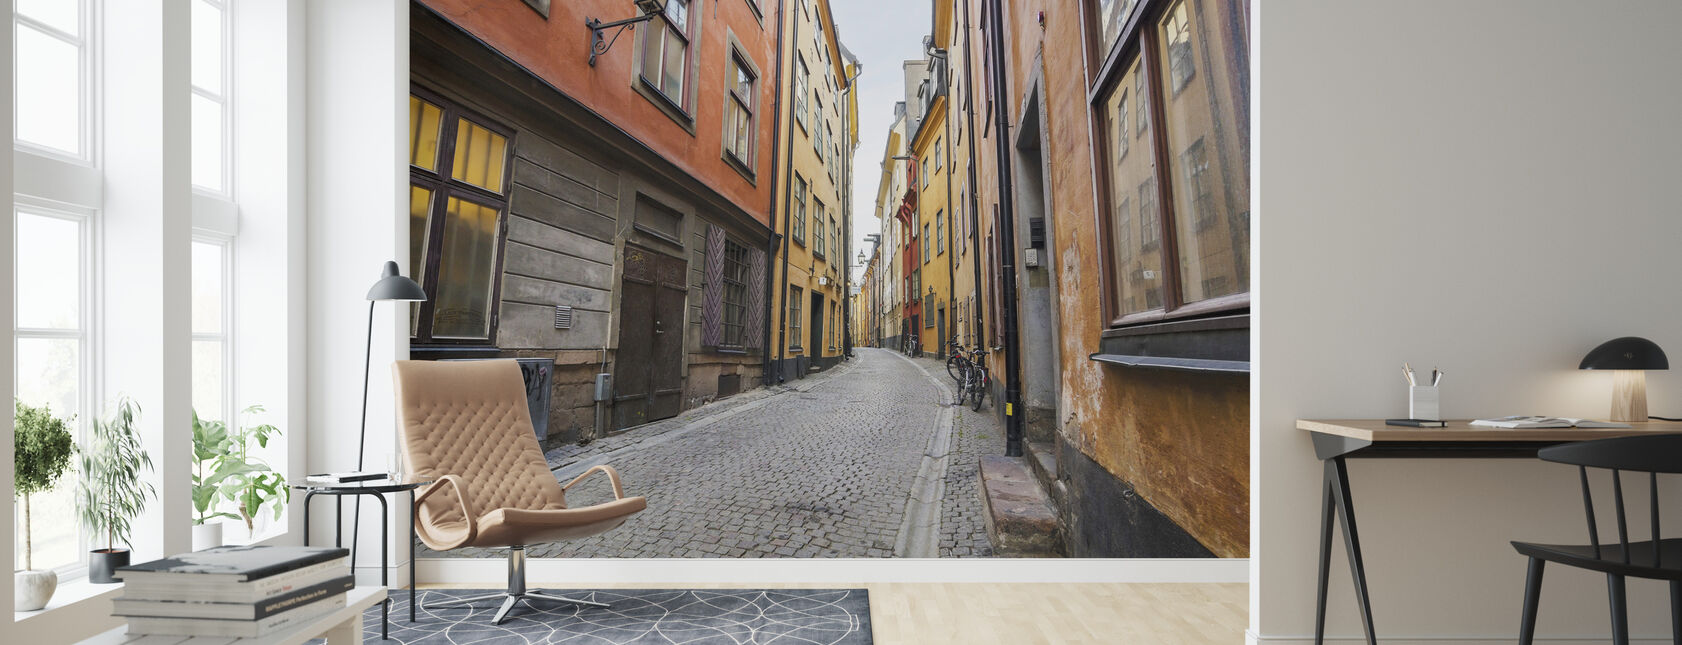 Gata i Gamla Stan Stockholm - Tapet - Vardagsrum